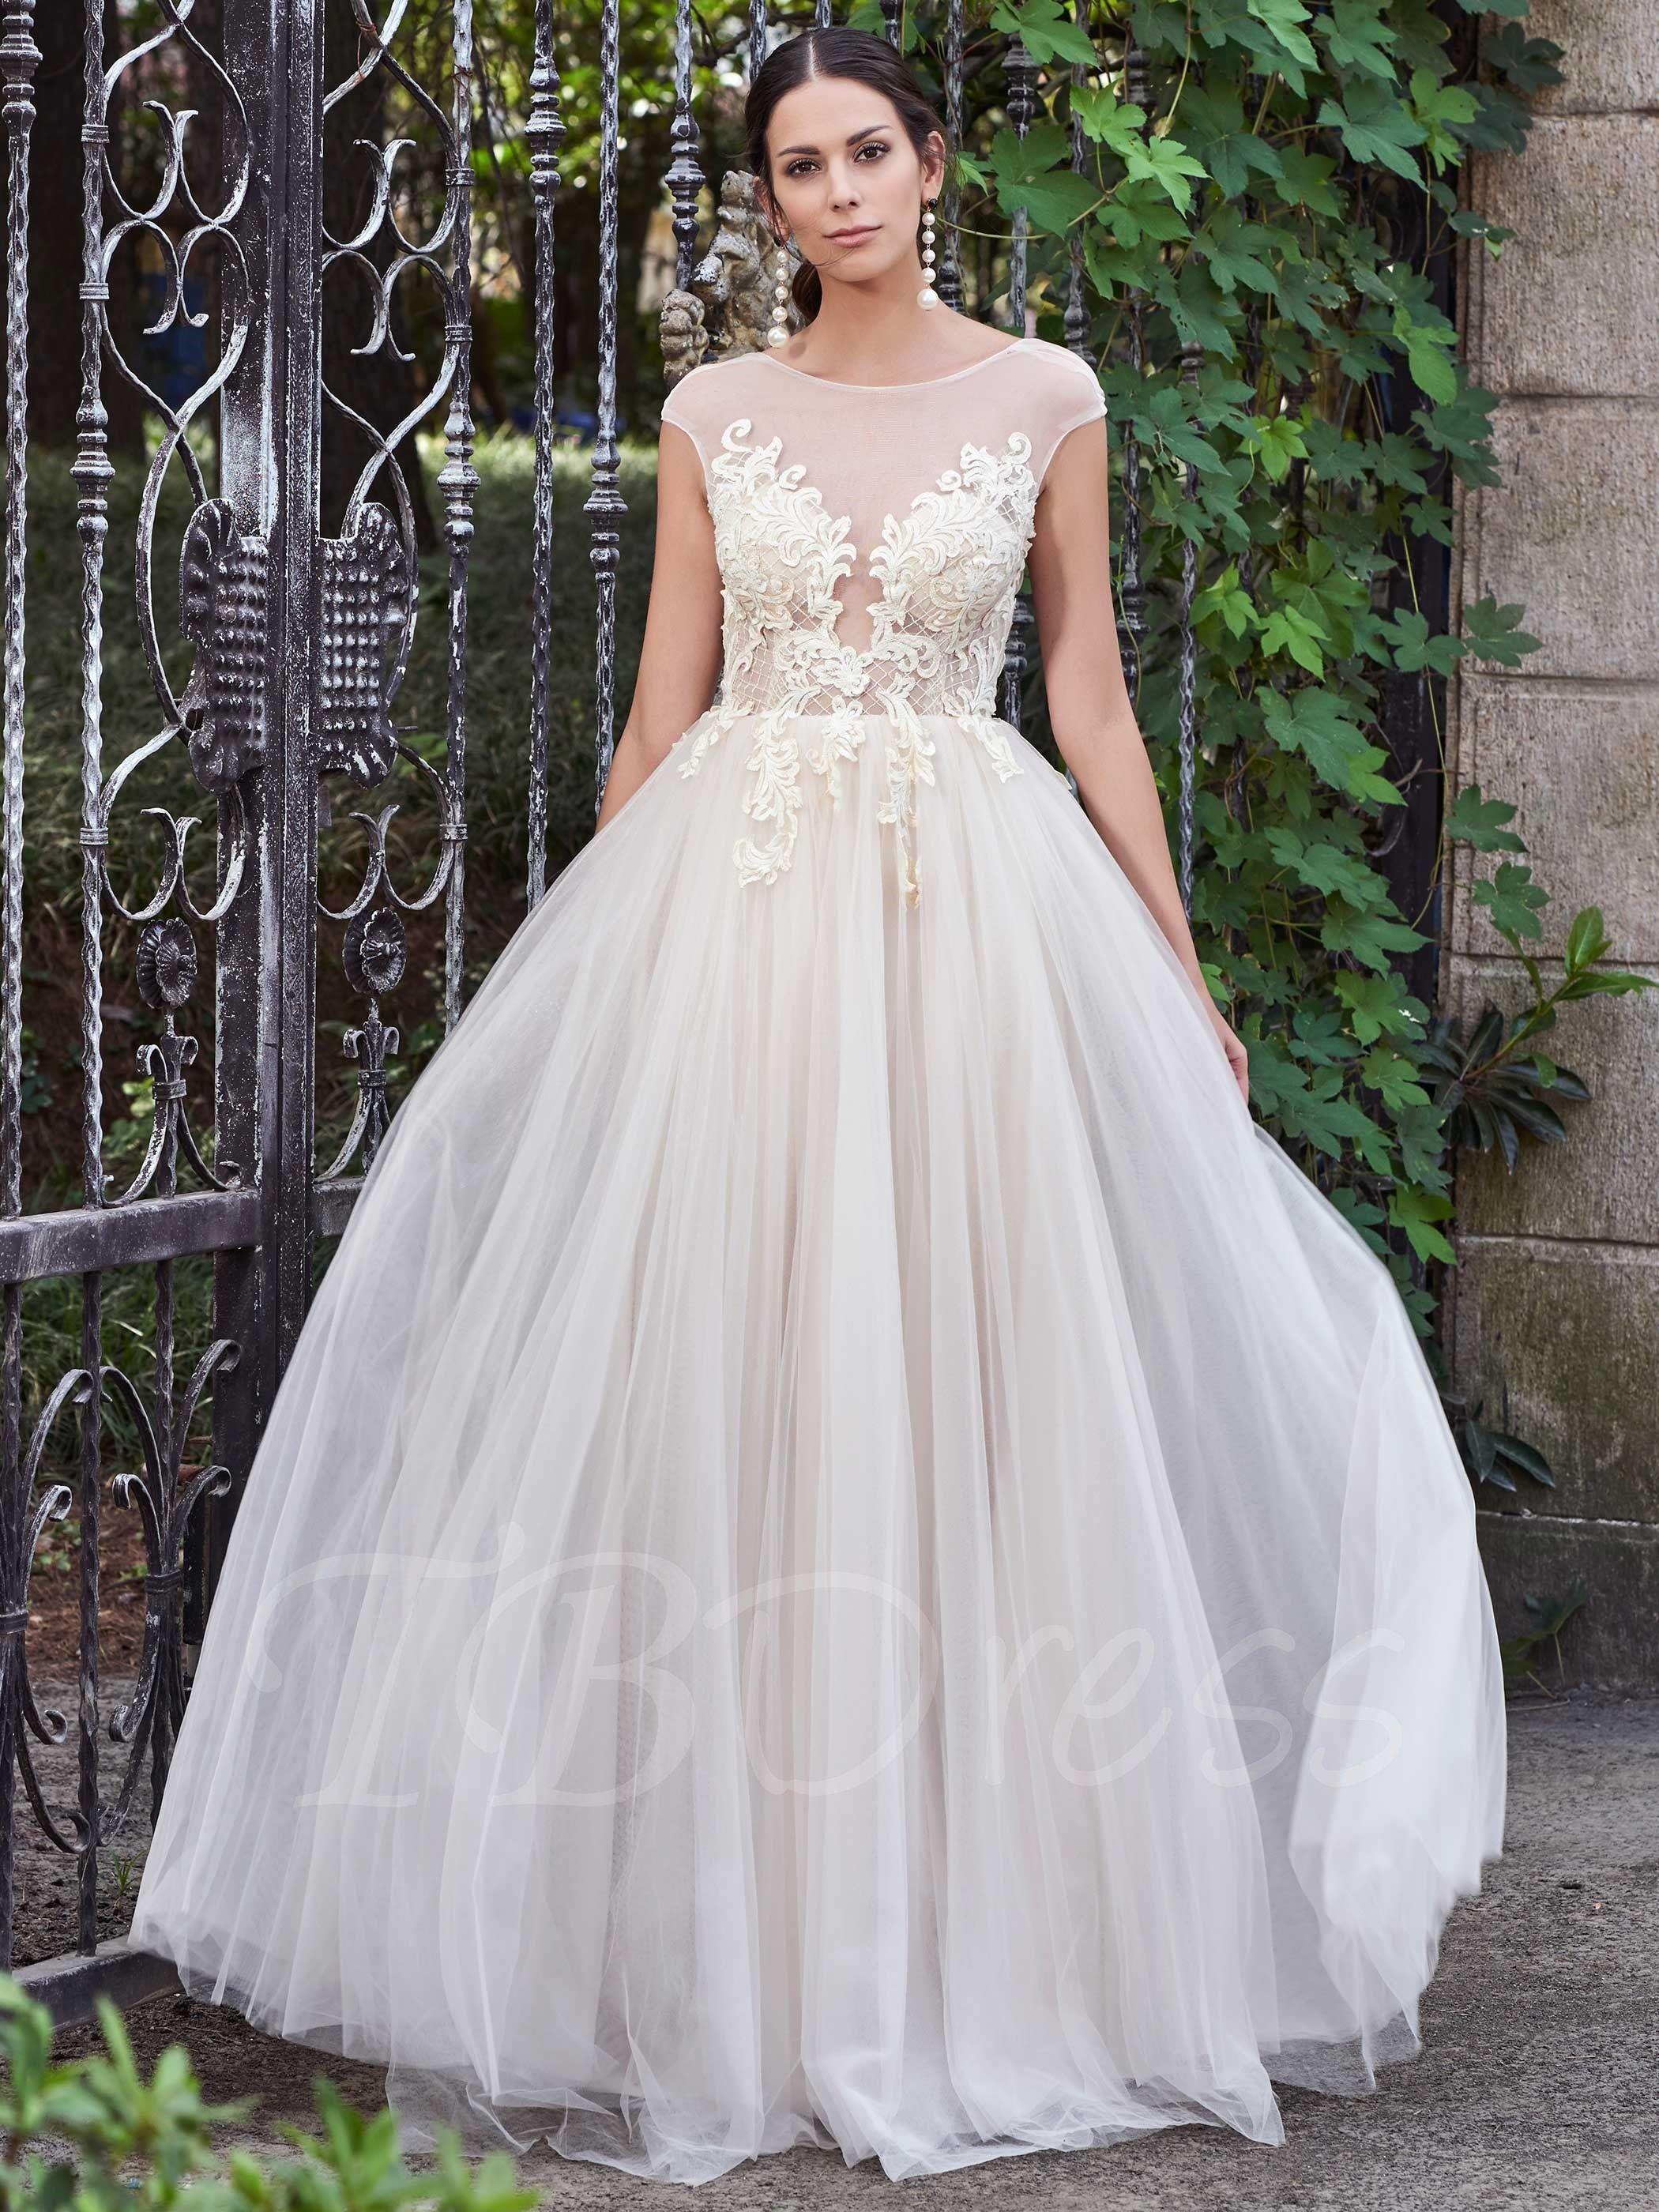 17++ Scoop neck wedding gown ideas